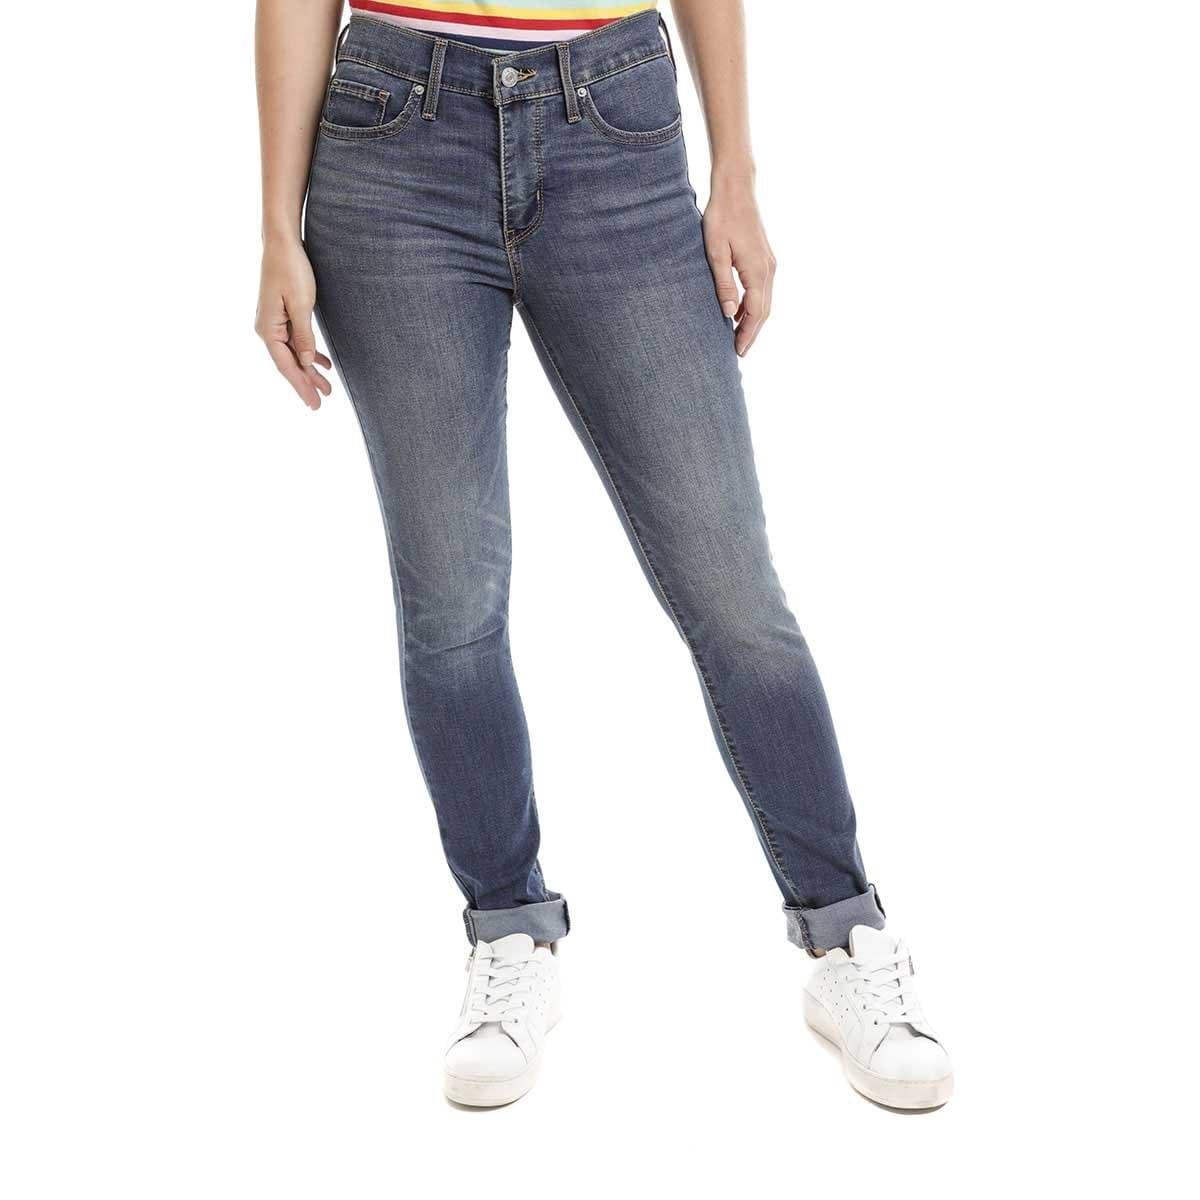 Jeans 311 Shaping Skinny Levis para Dama